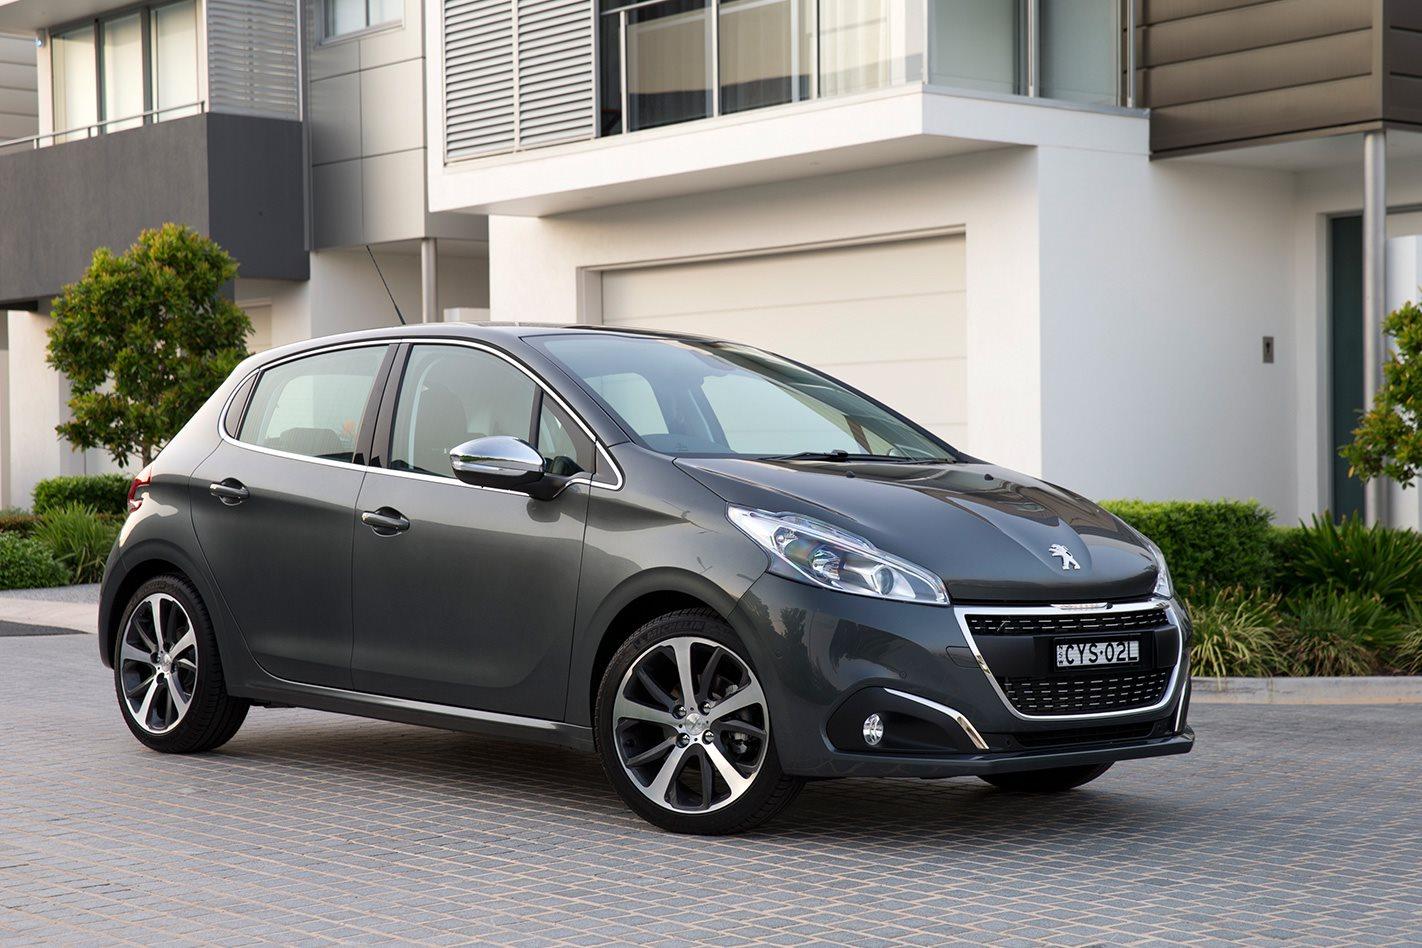 2018 Peugeot 208 Range Review